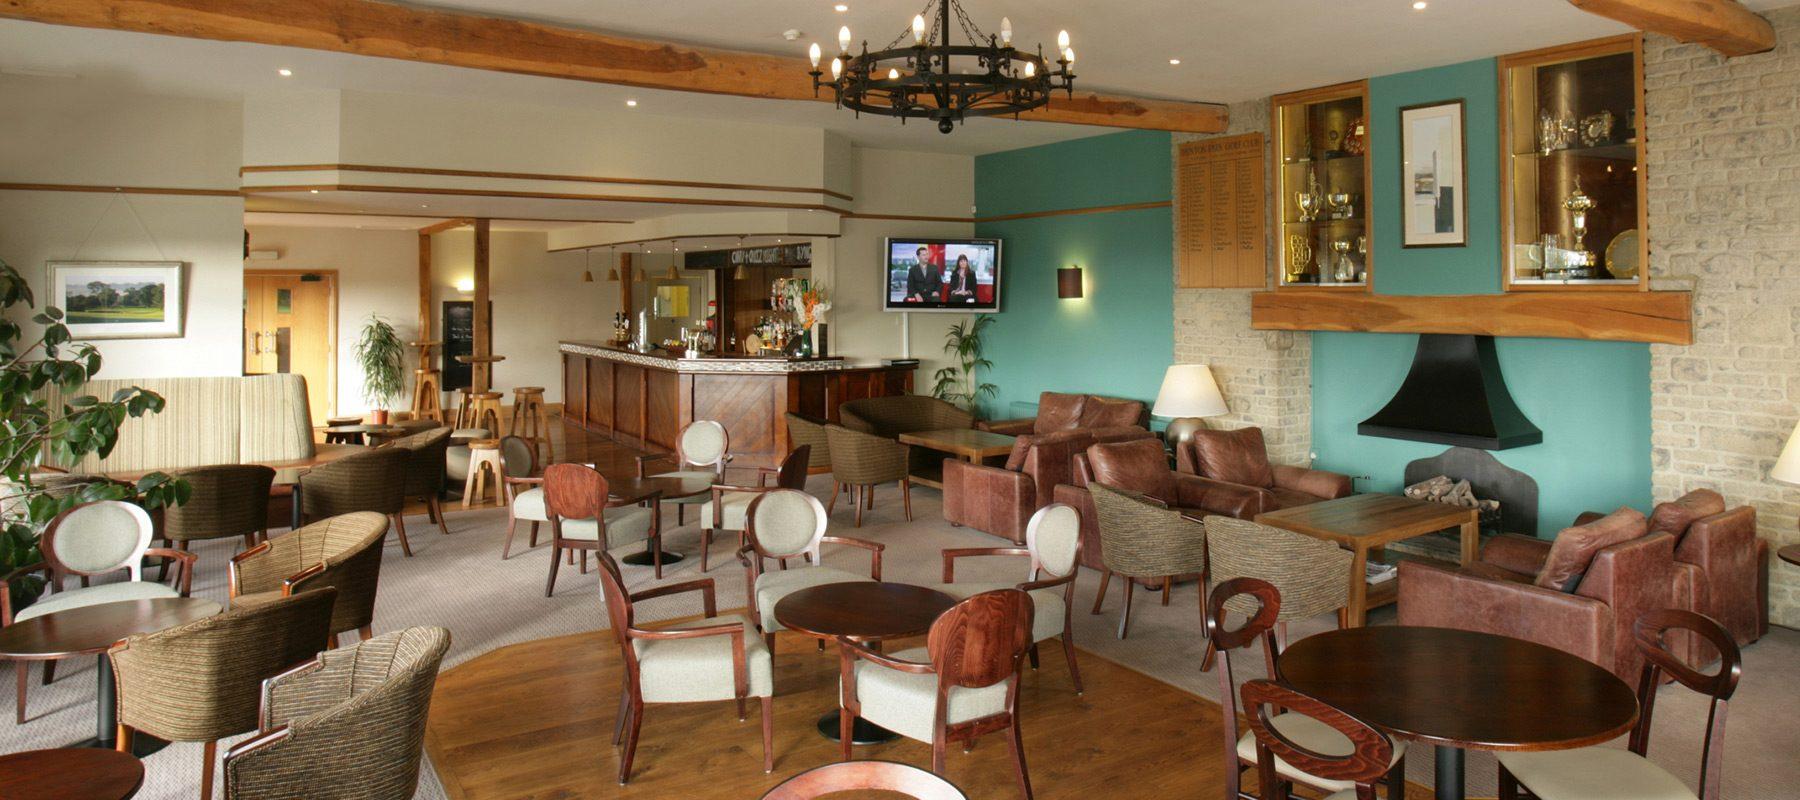 dainton park interior design lighting bar bespoke chair golf club